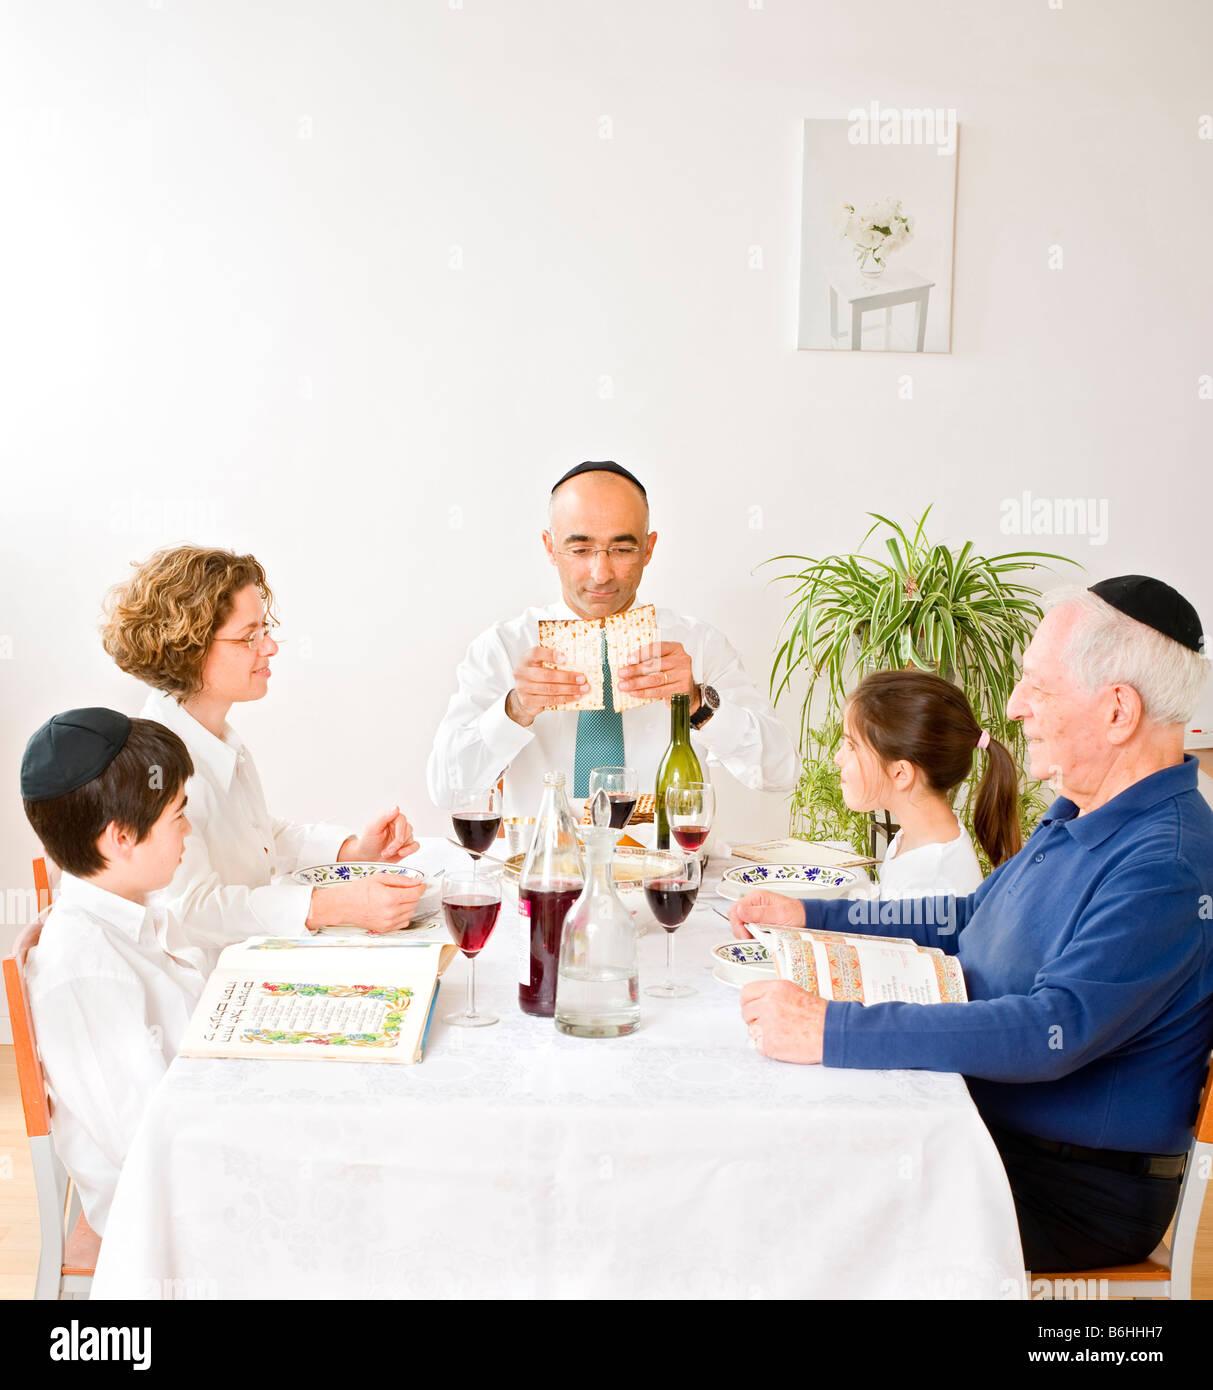 jewish family in seder celebrating passover - Stock Image